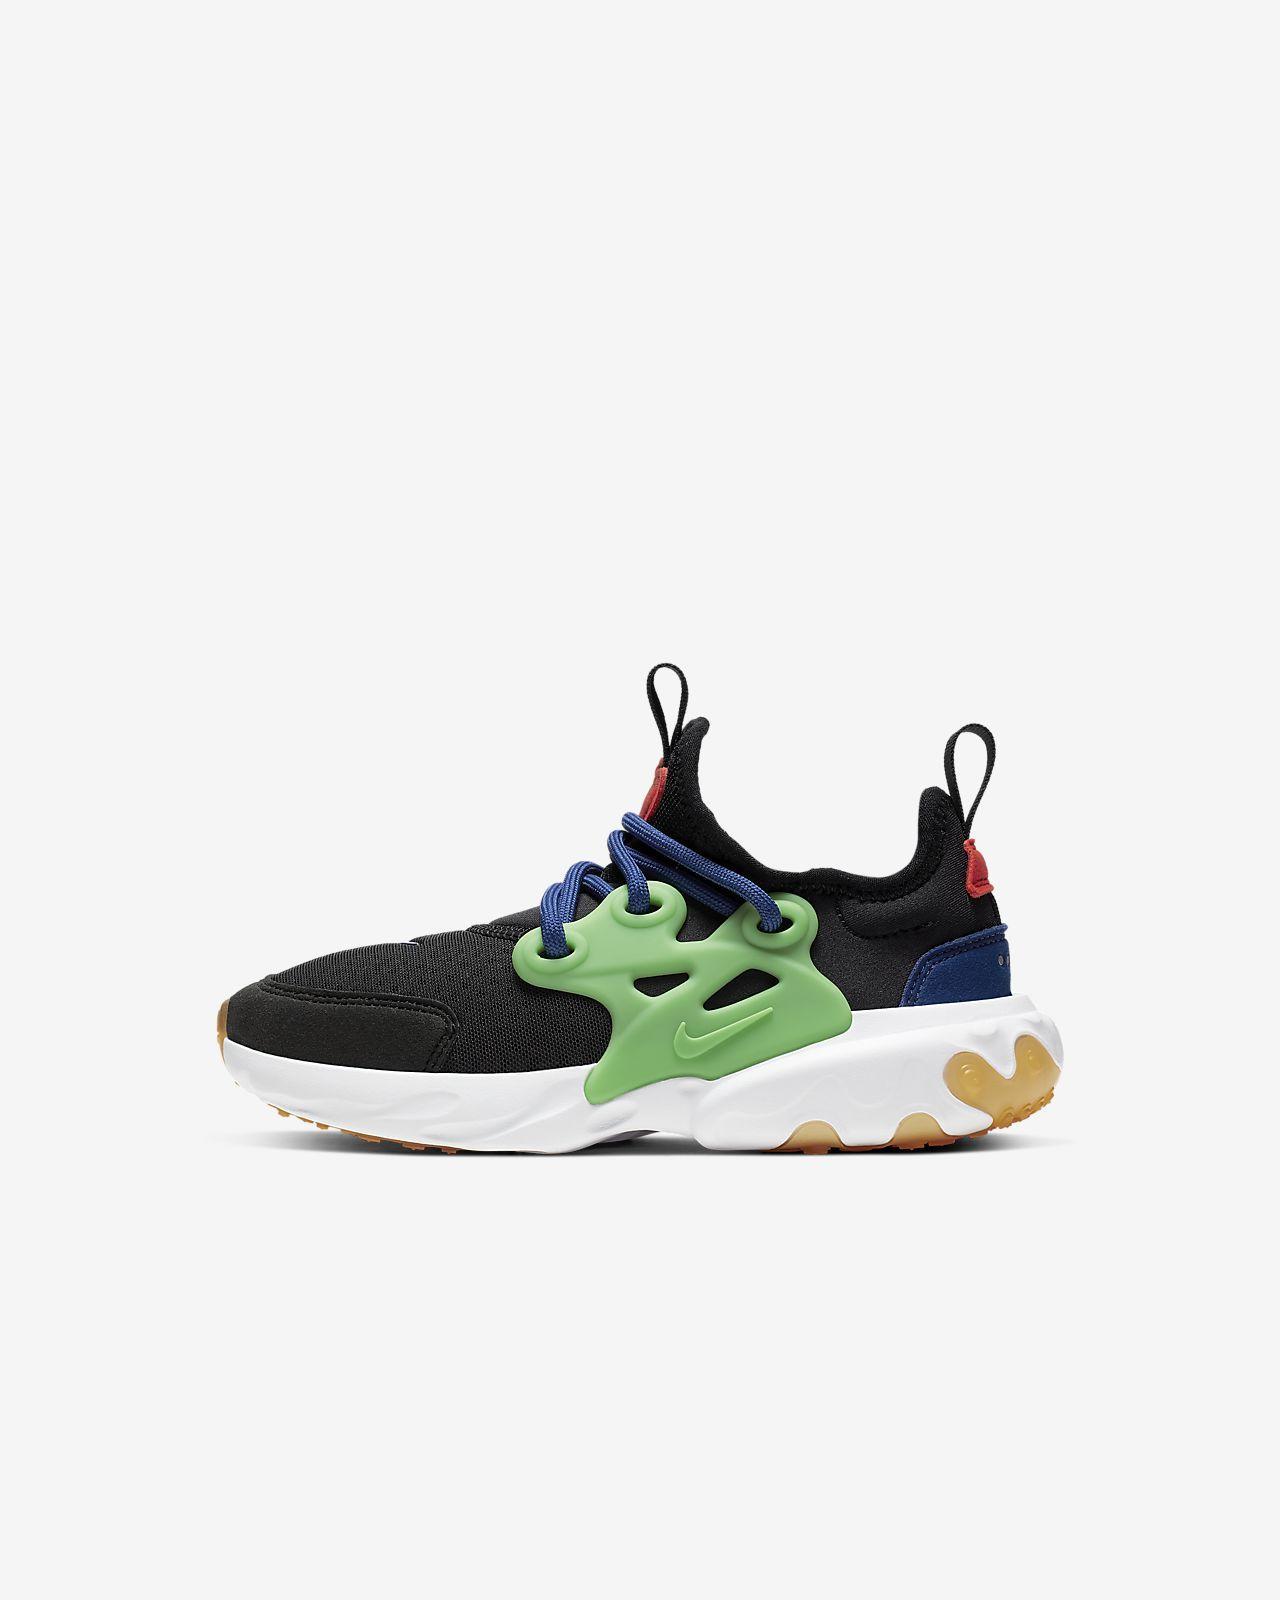 Nike RT Presto Kleuterschoen